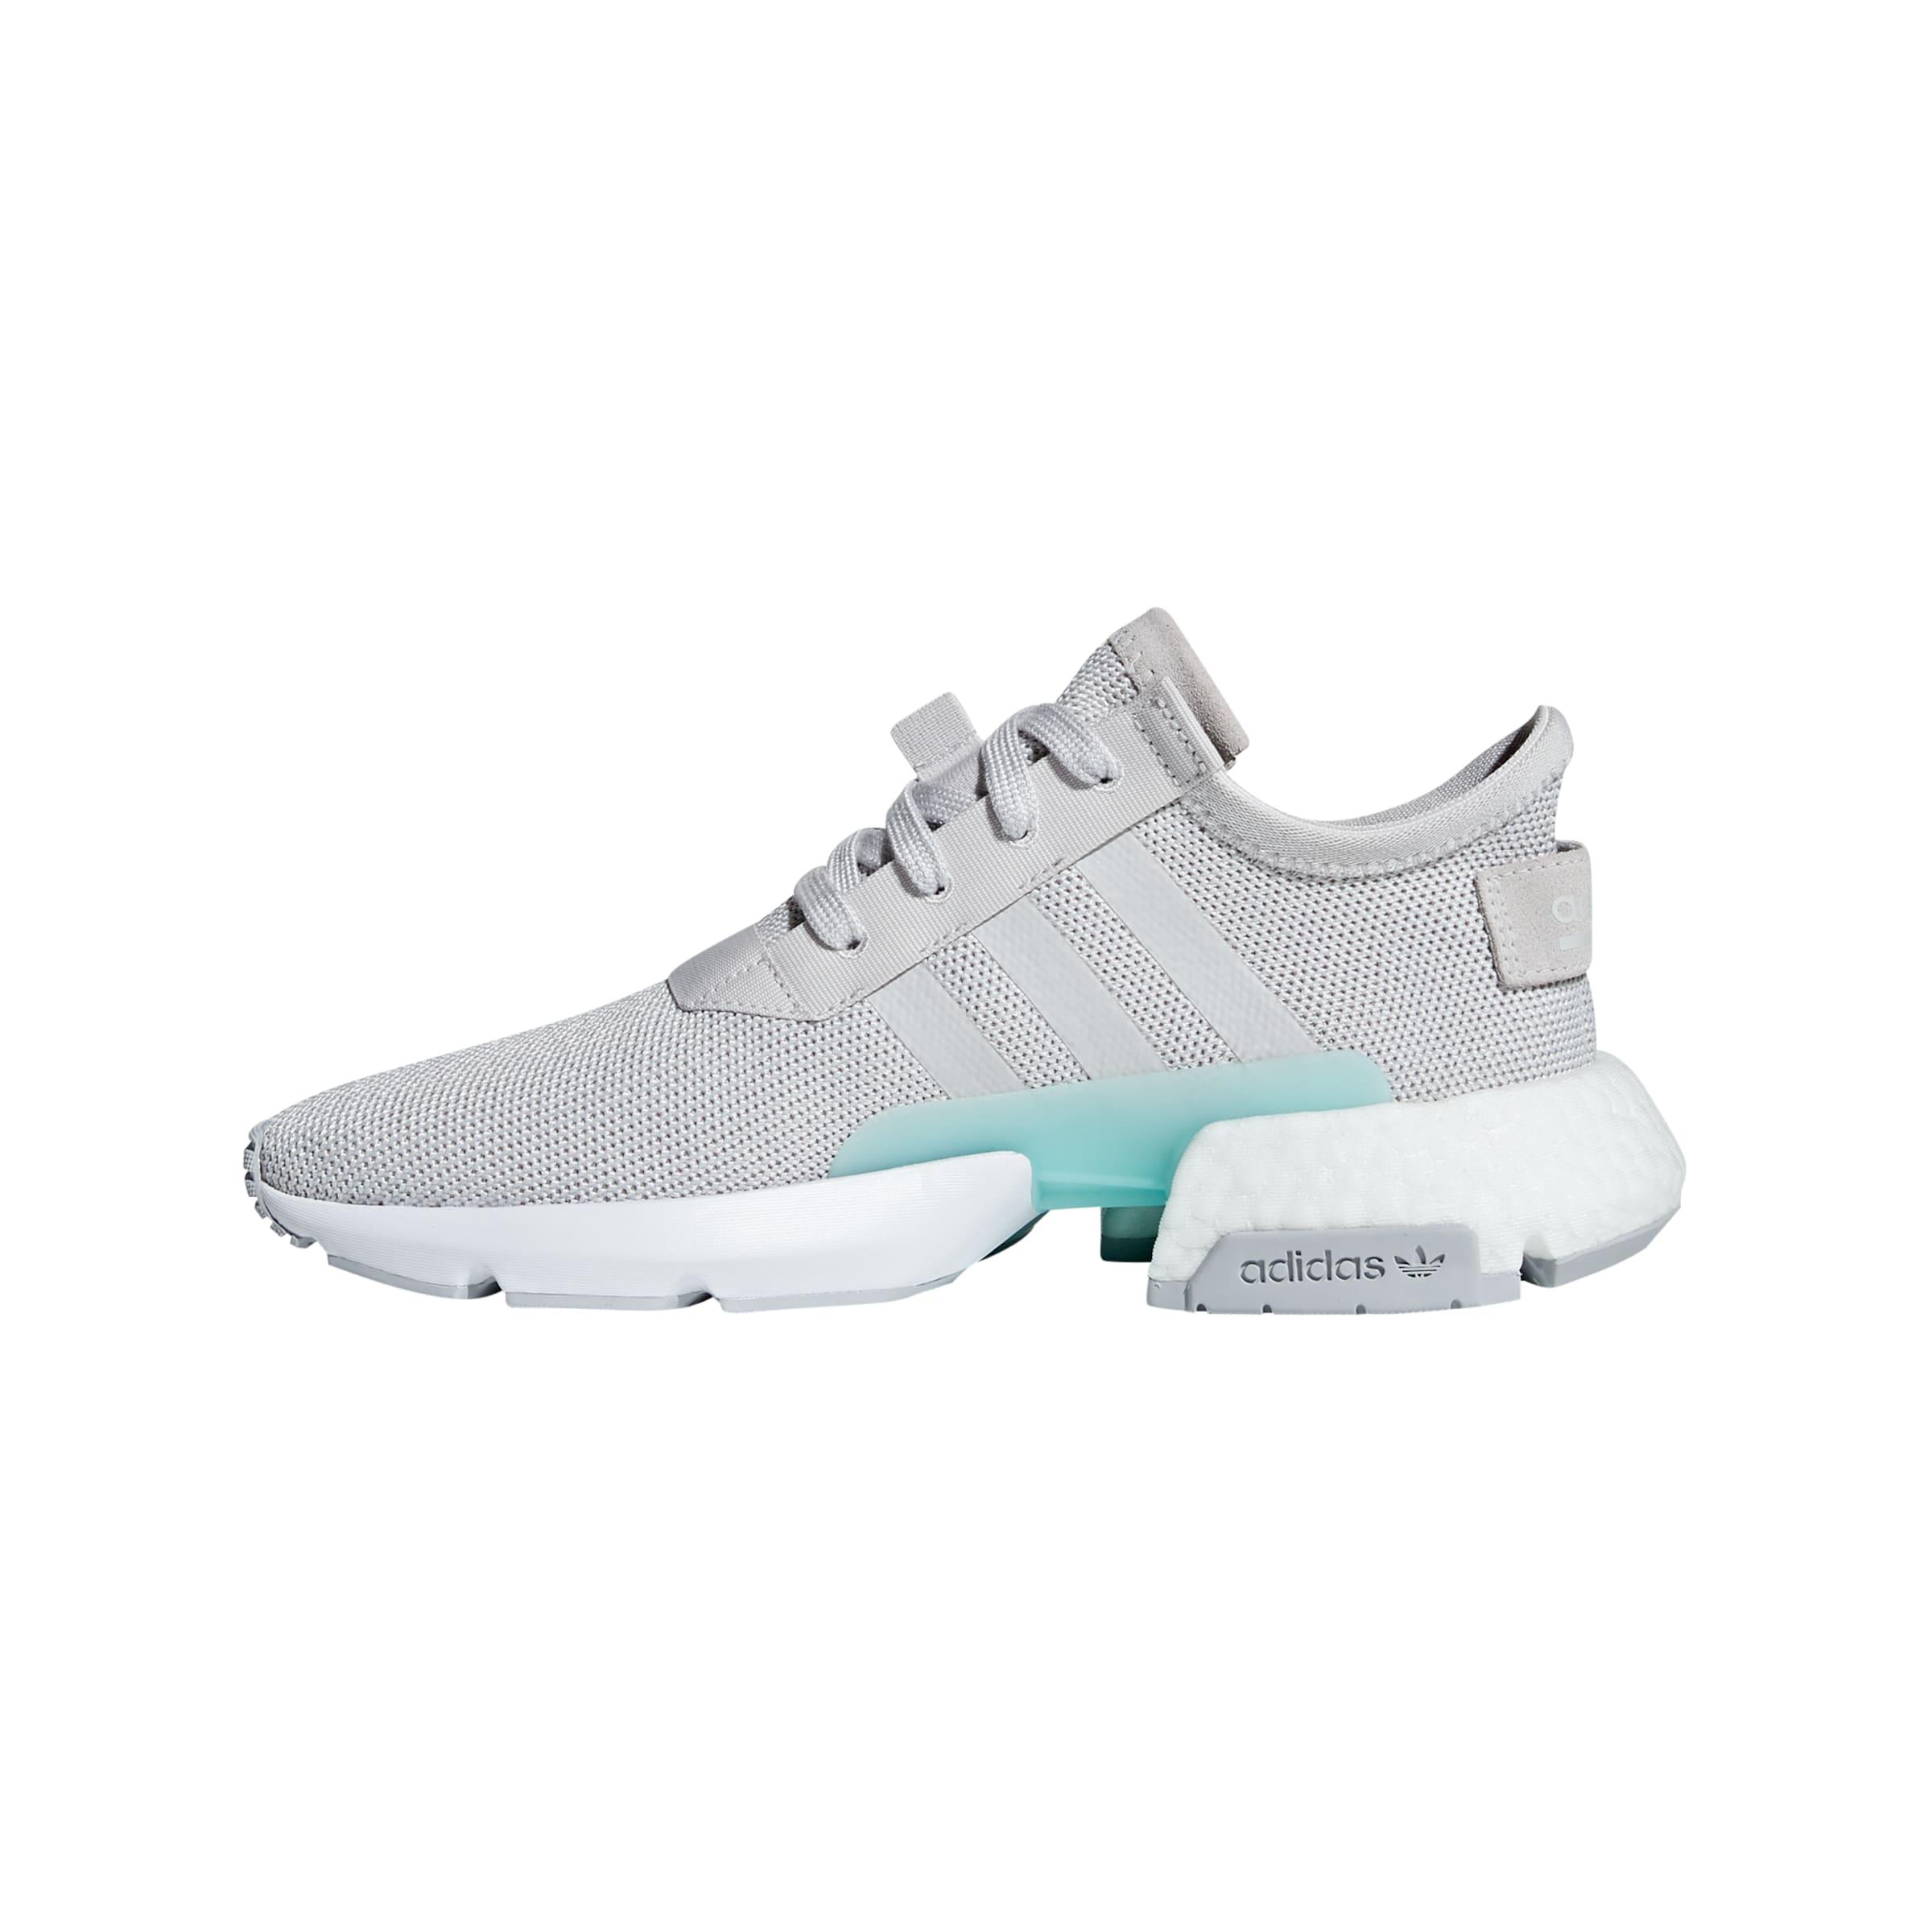 ADIDAS ORIGINALS Sneaker POD-S3.1 W Hohe Qualität